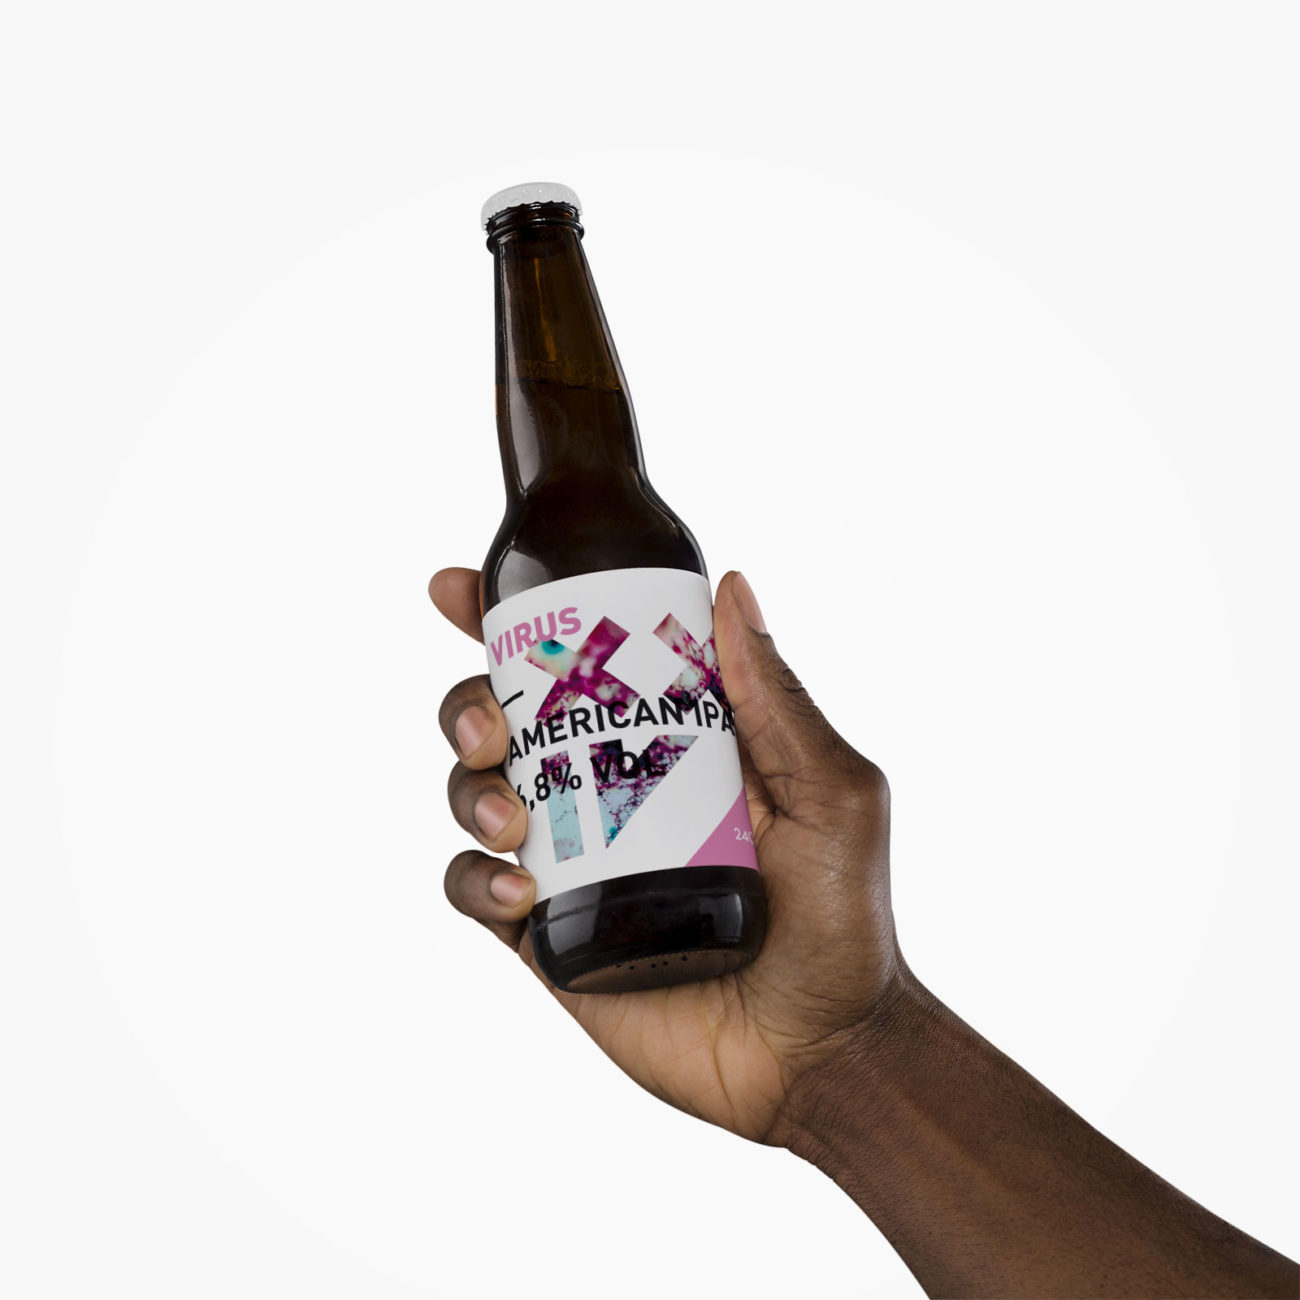 Birra artigianale Virus 24ore